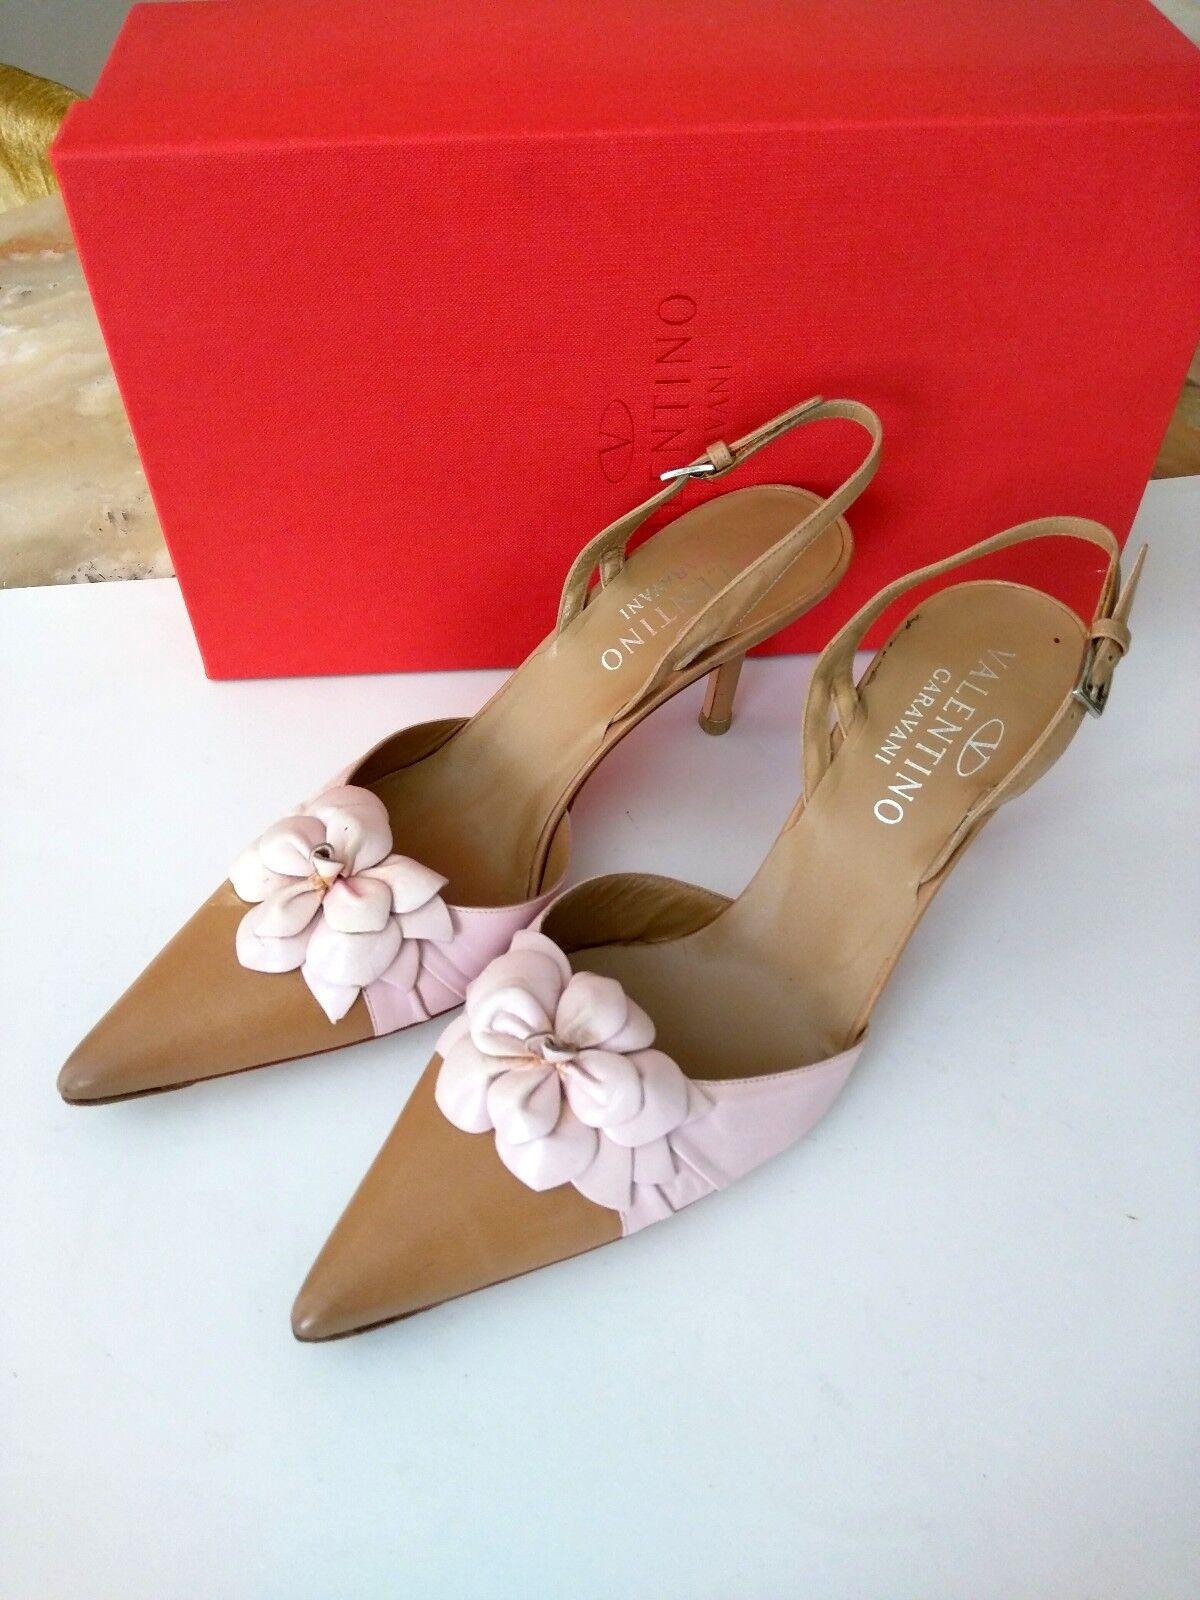 Valentino Garavani Flower High High High Hill Leather chaussures- Taille 39 d1dcea